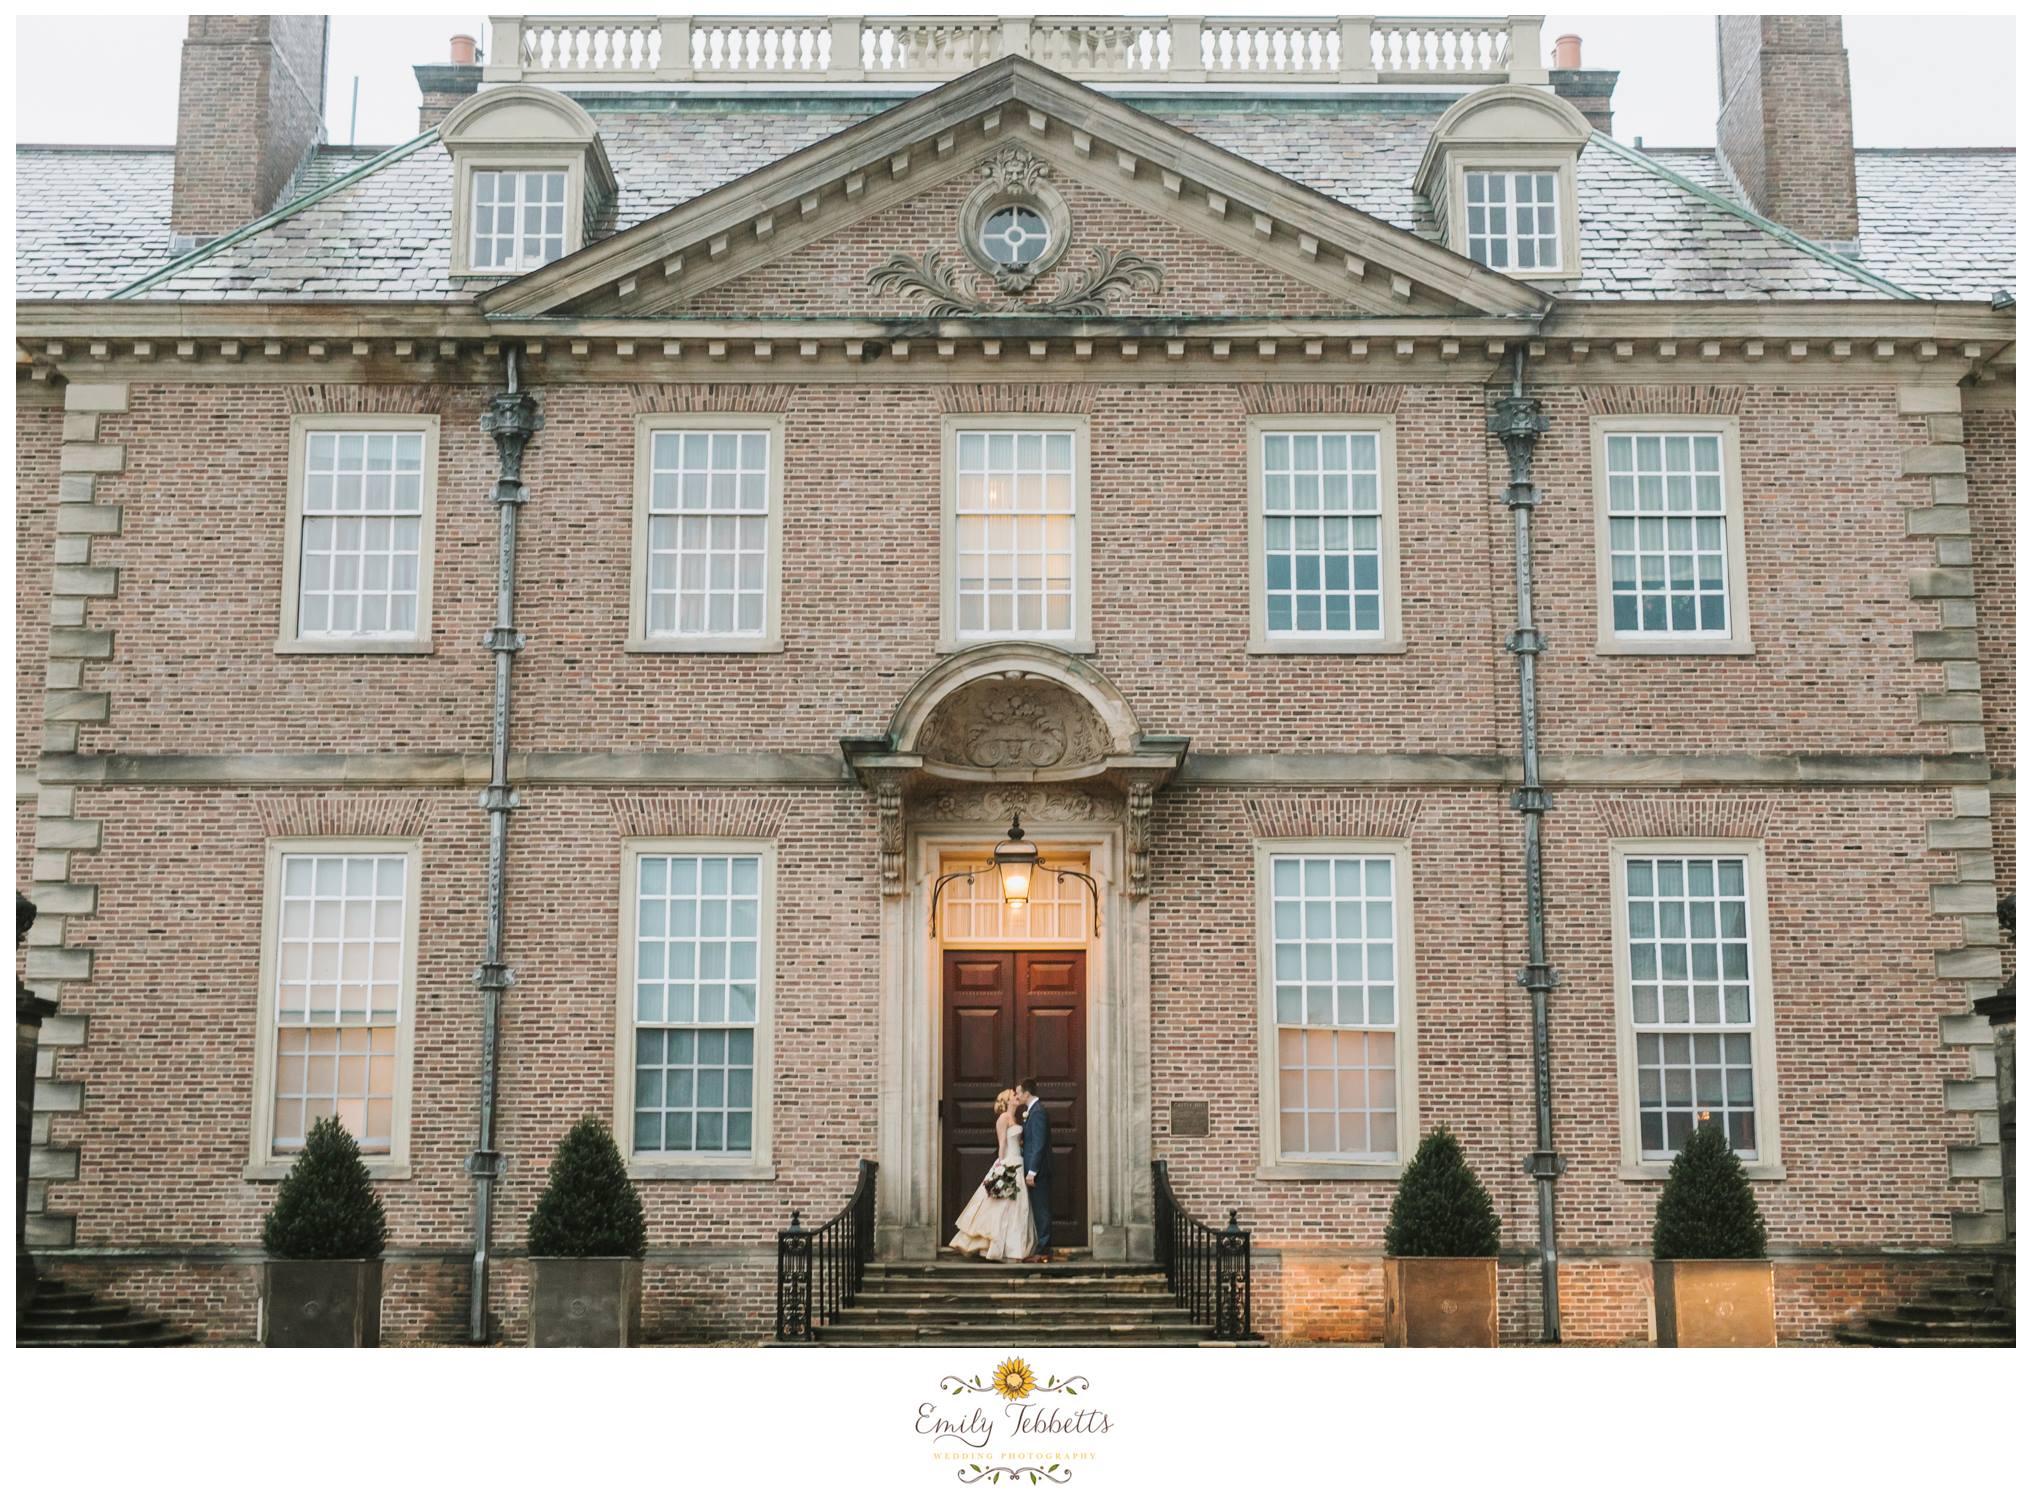 Crane Estate, Ipswich, MA - Emily Tebbetts Wedding Photography 1.jpg